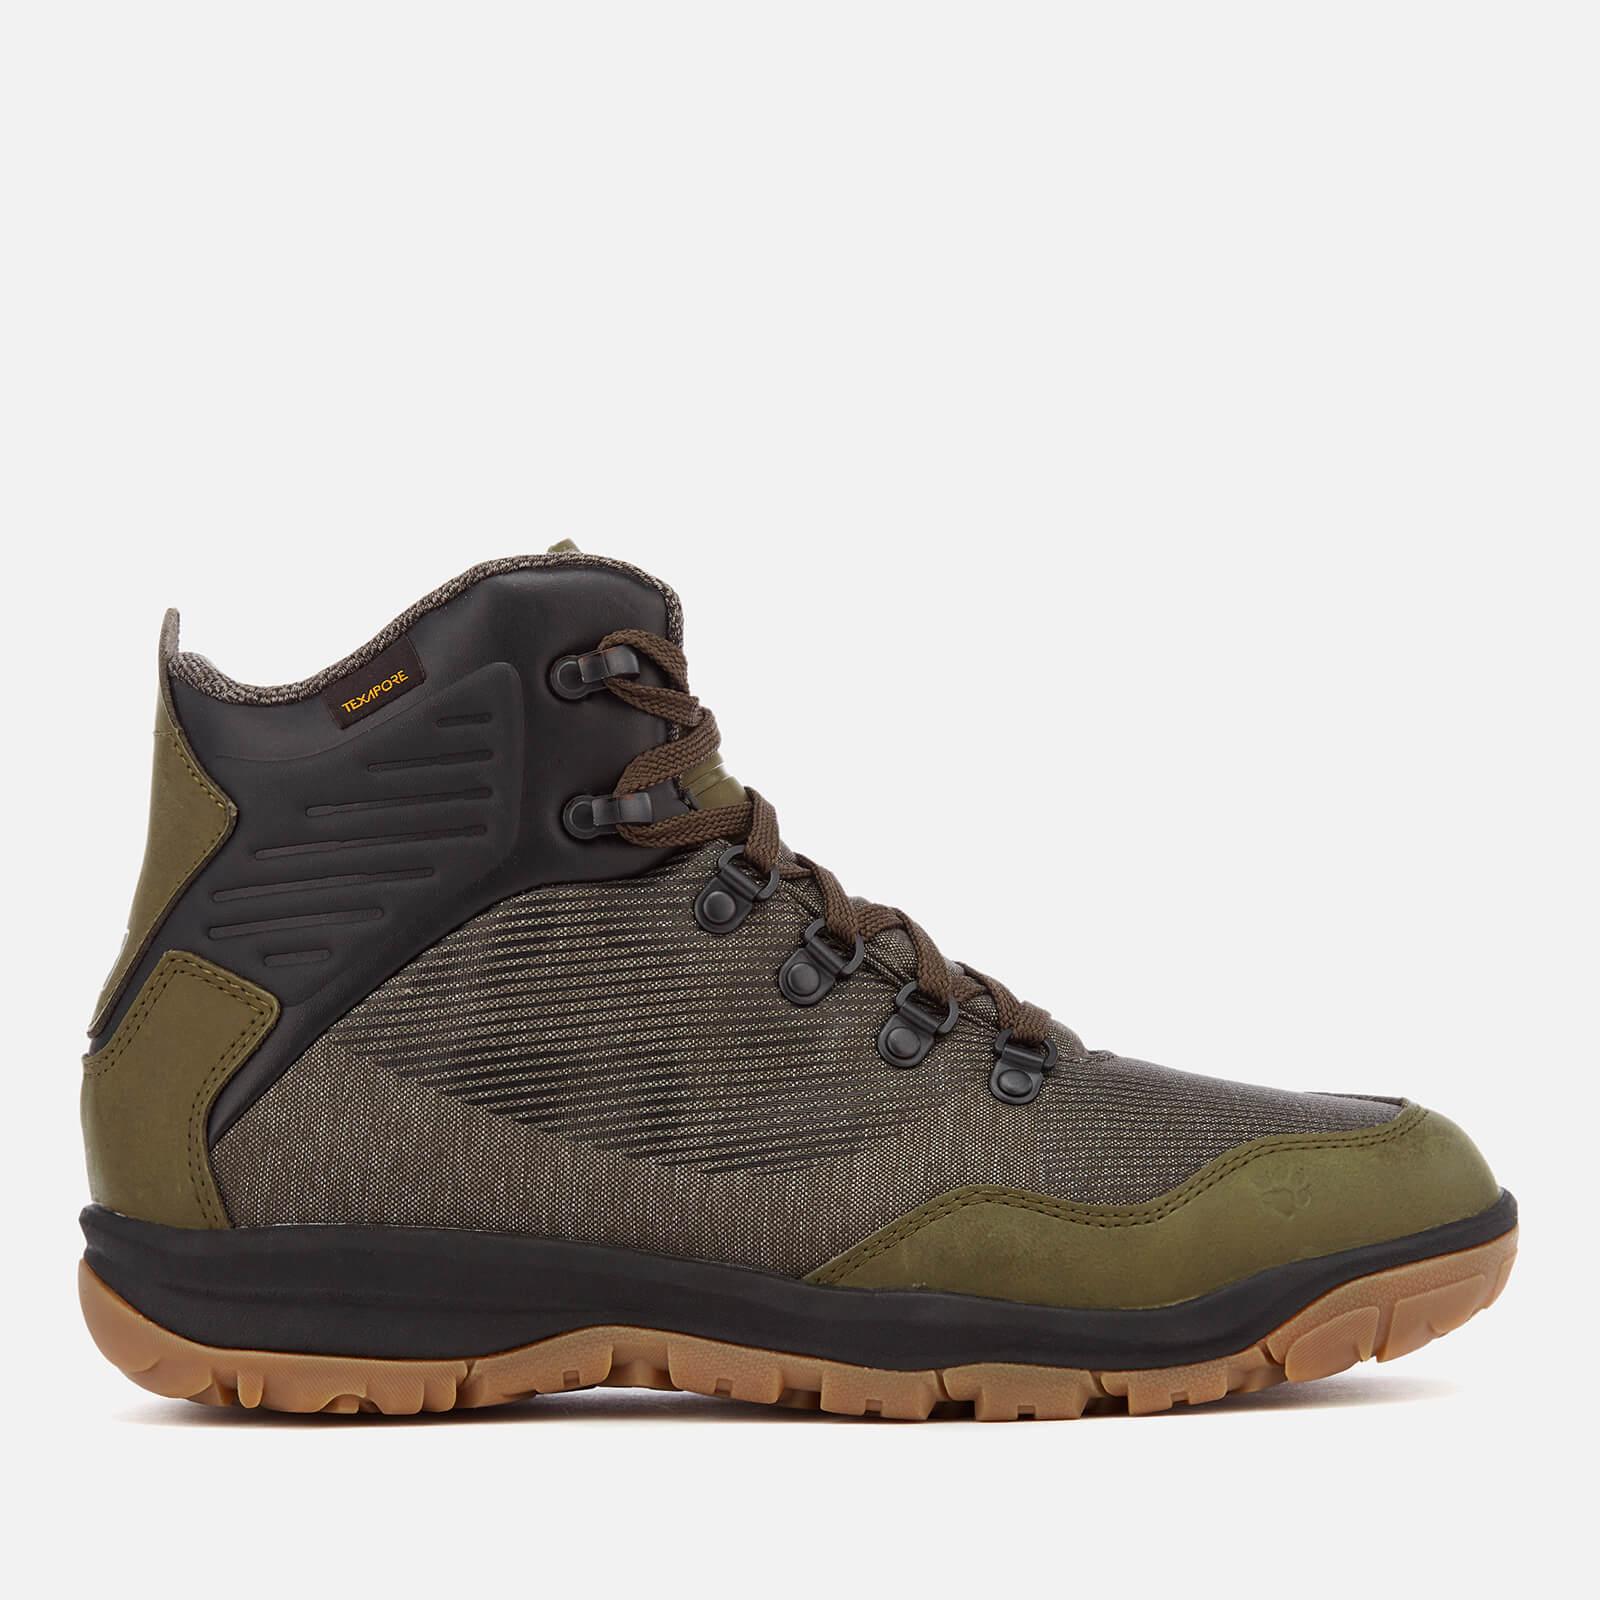 Jack Wolfskin Men's Seven Wonders Texapore Mid Walking Boots Pinewood